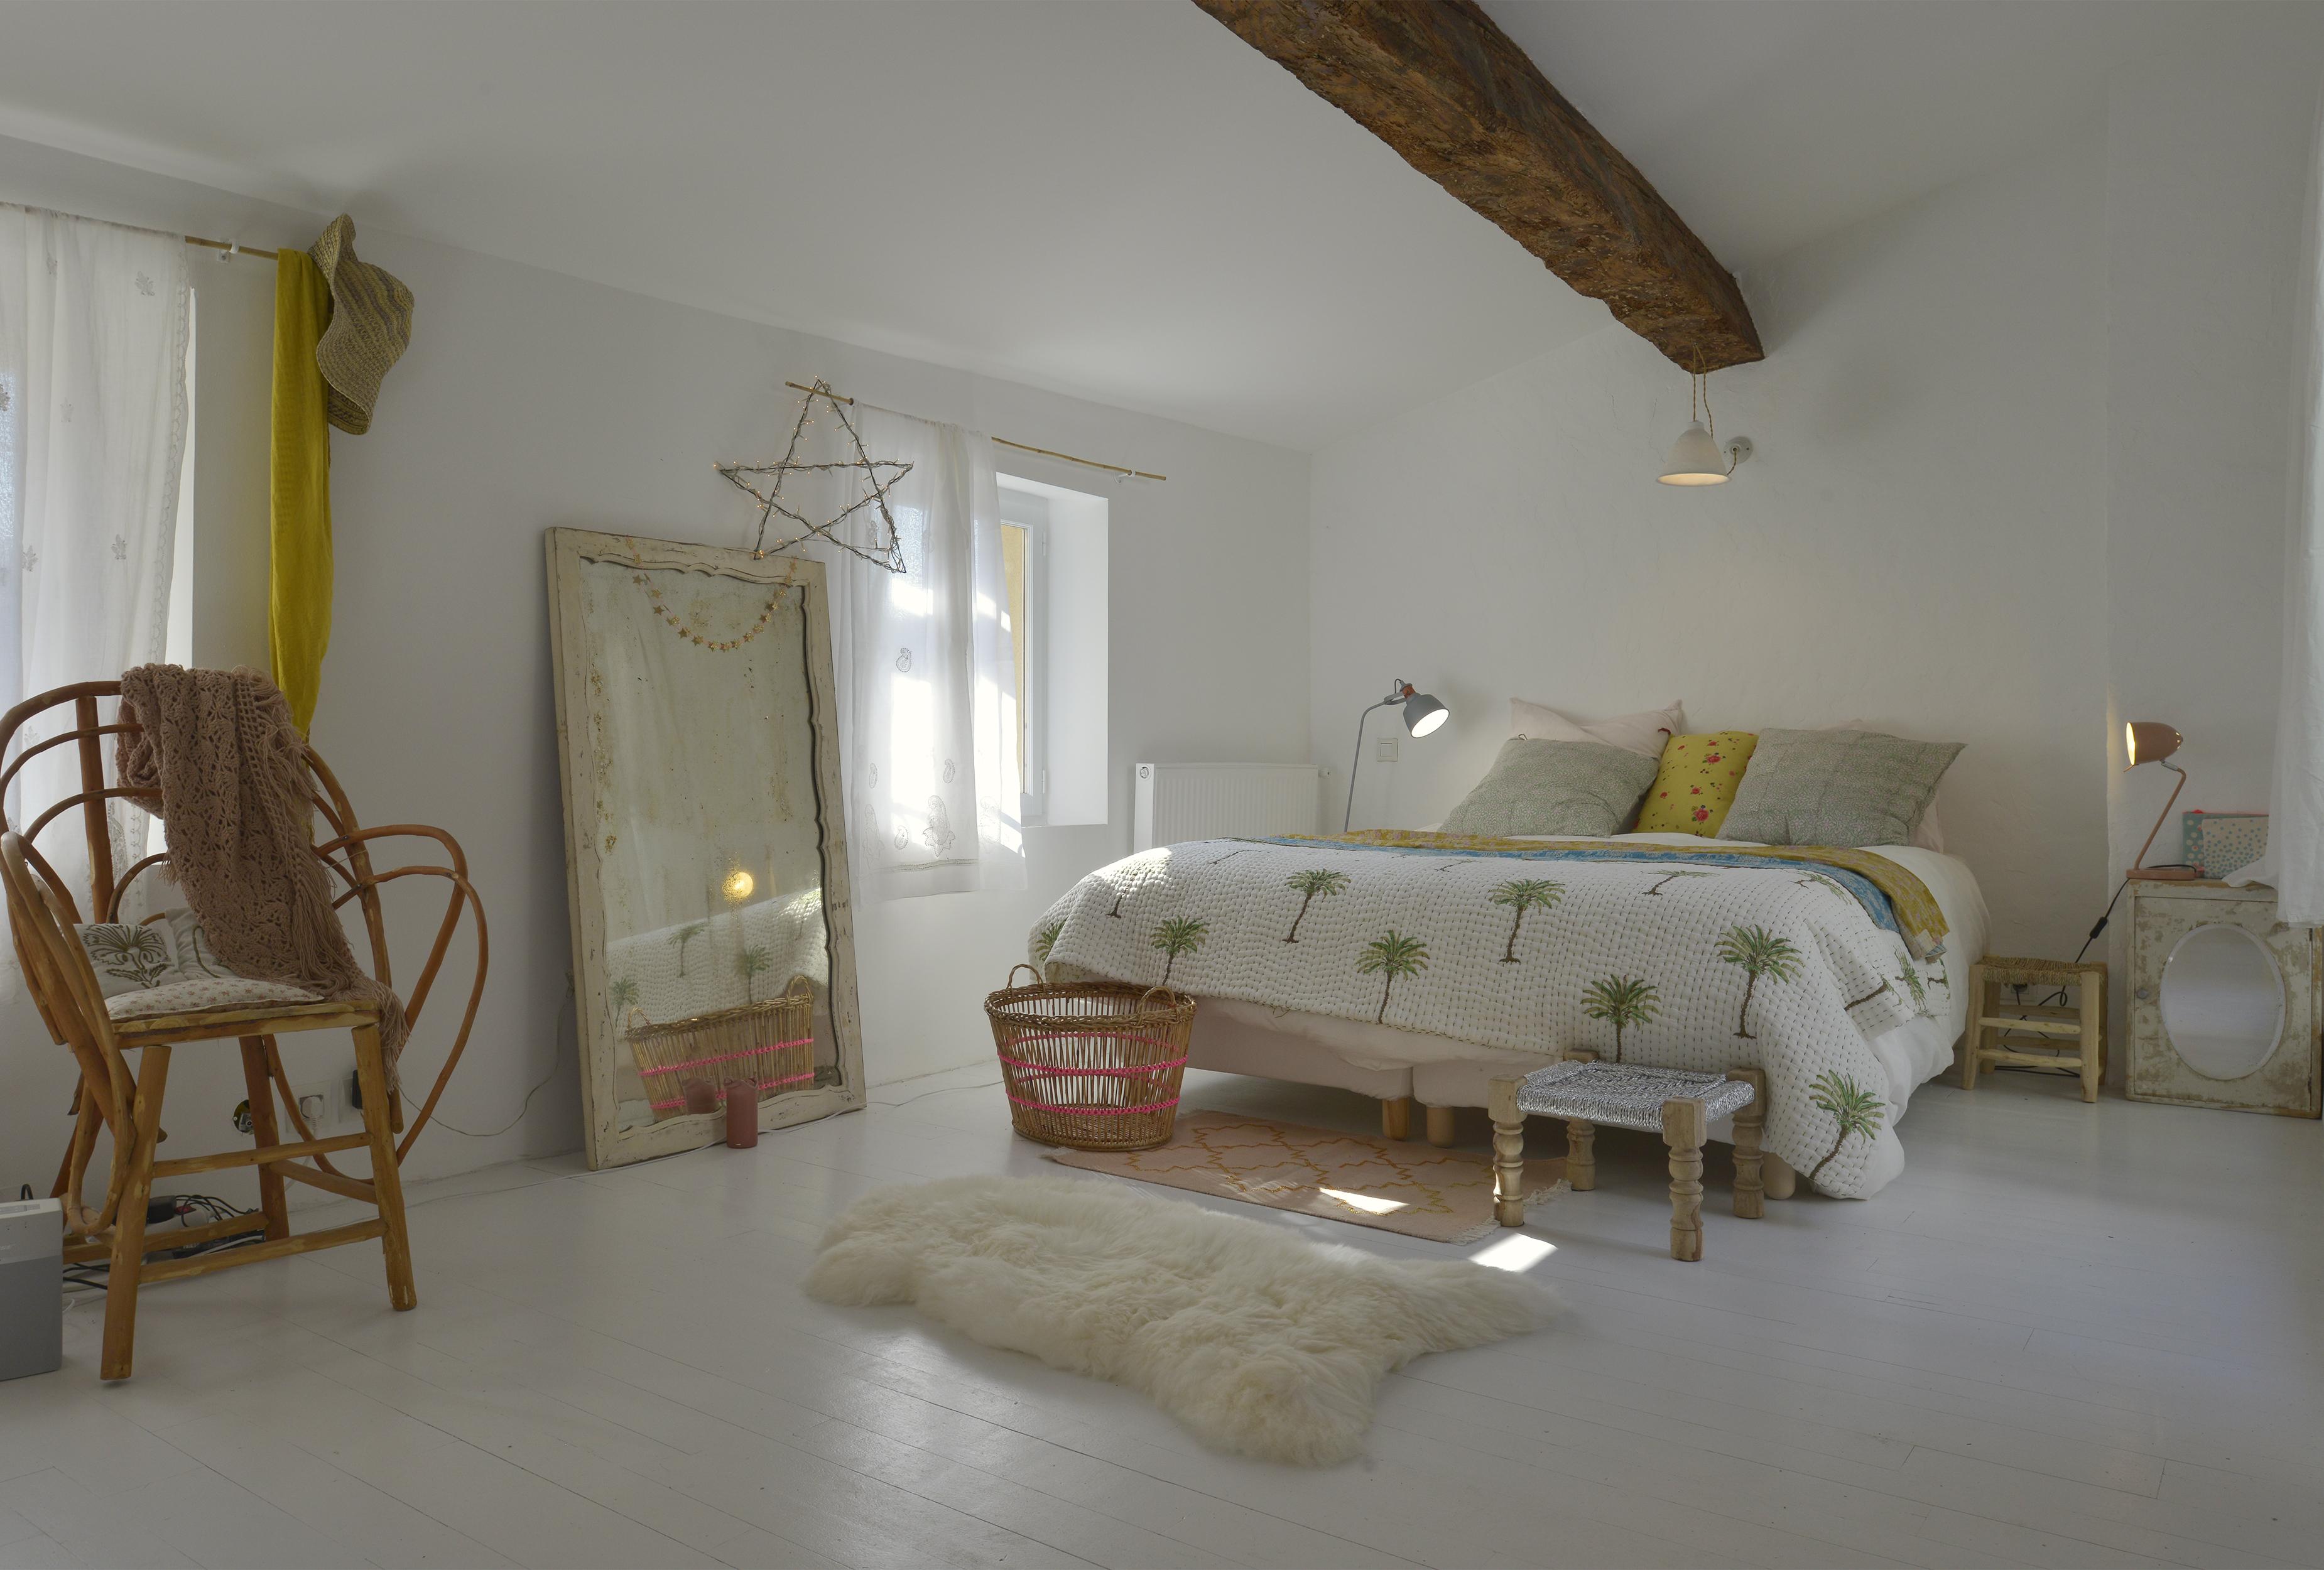 the Loft room